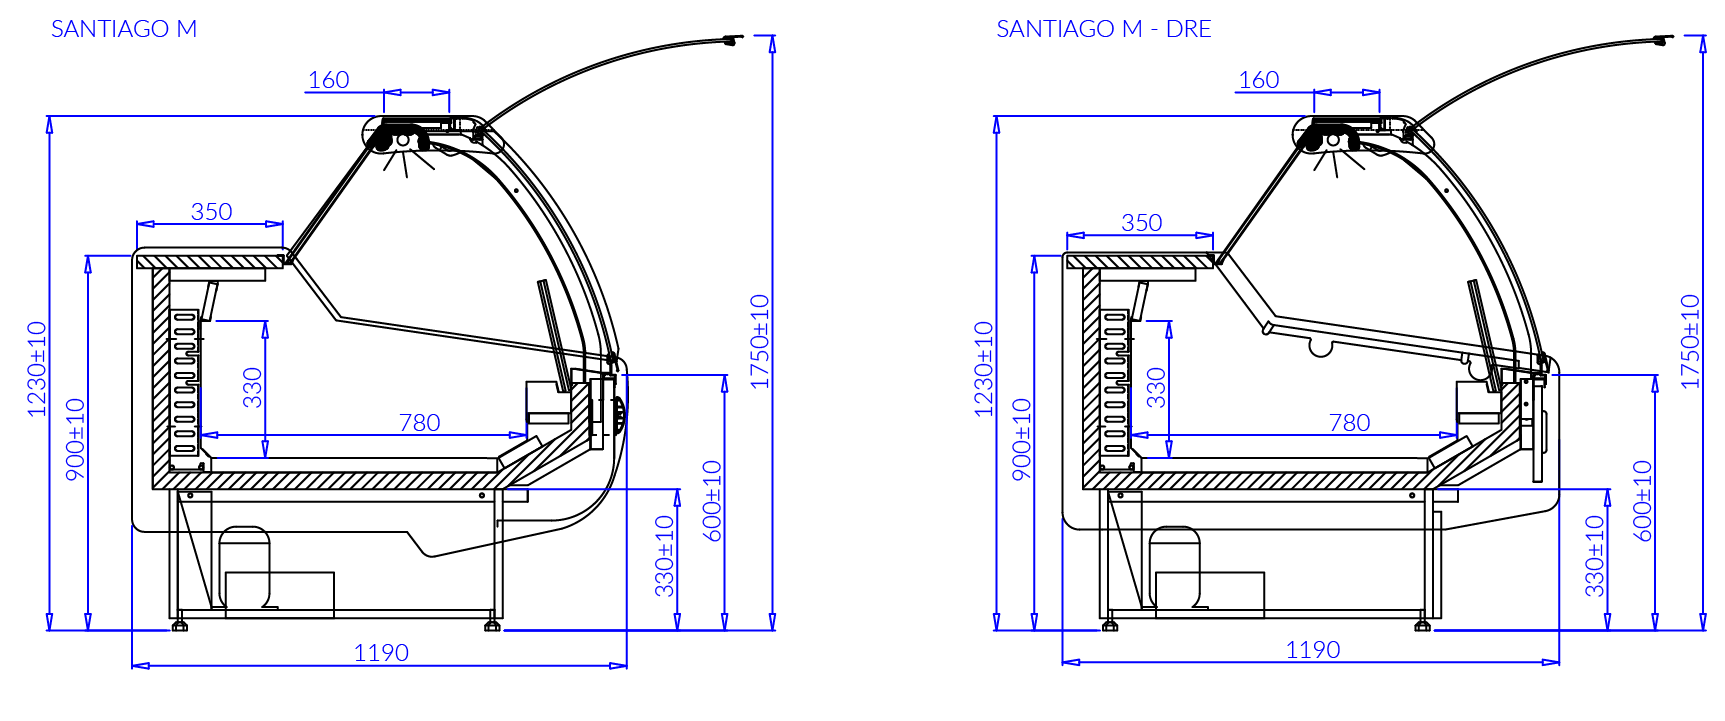 Технический чертеж SANTIAGO M